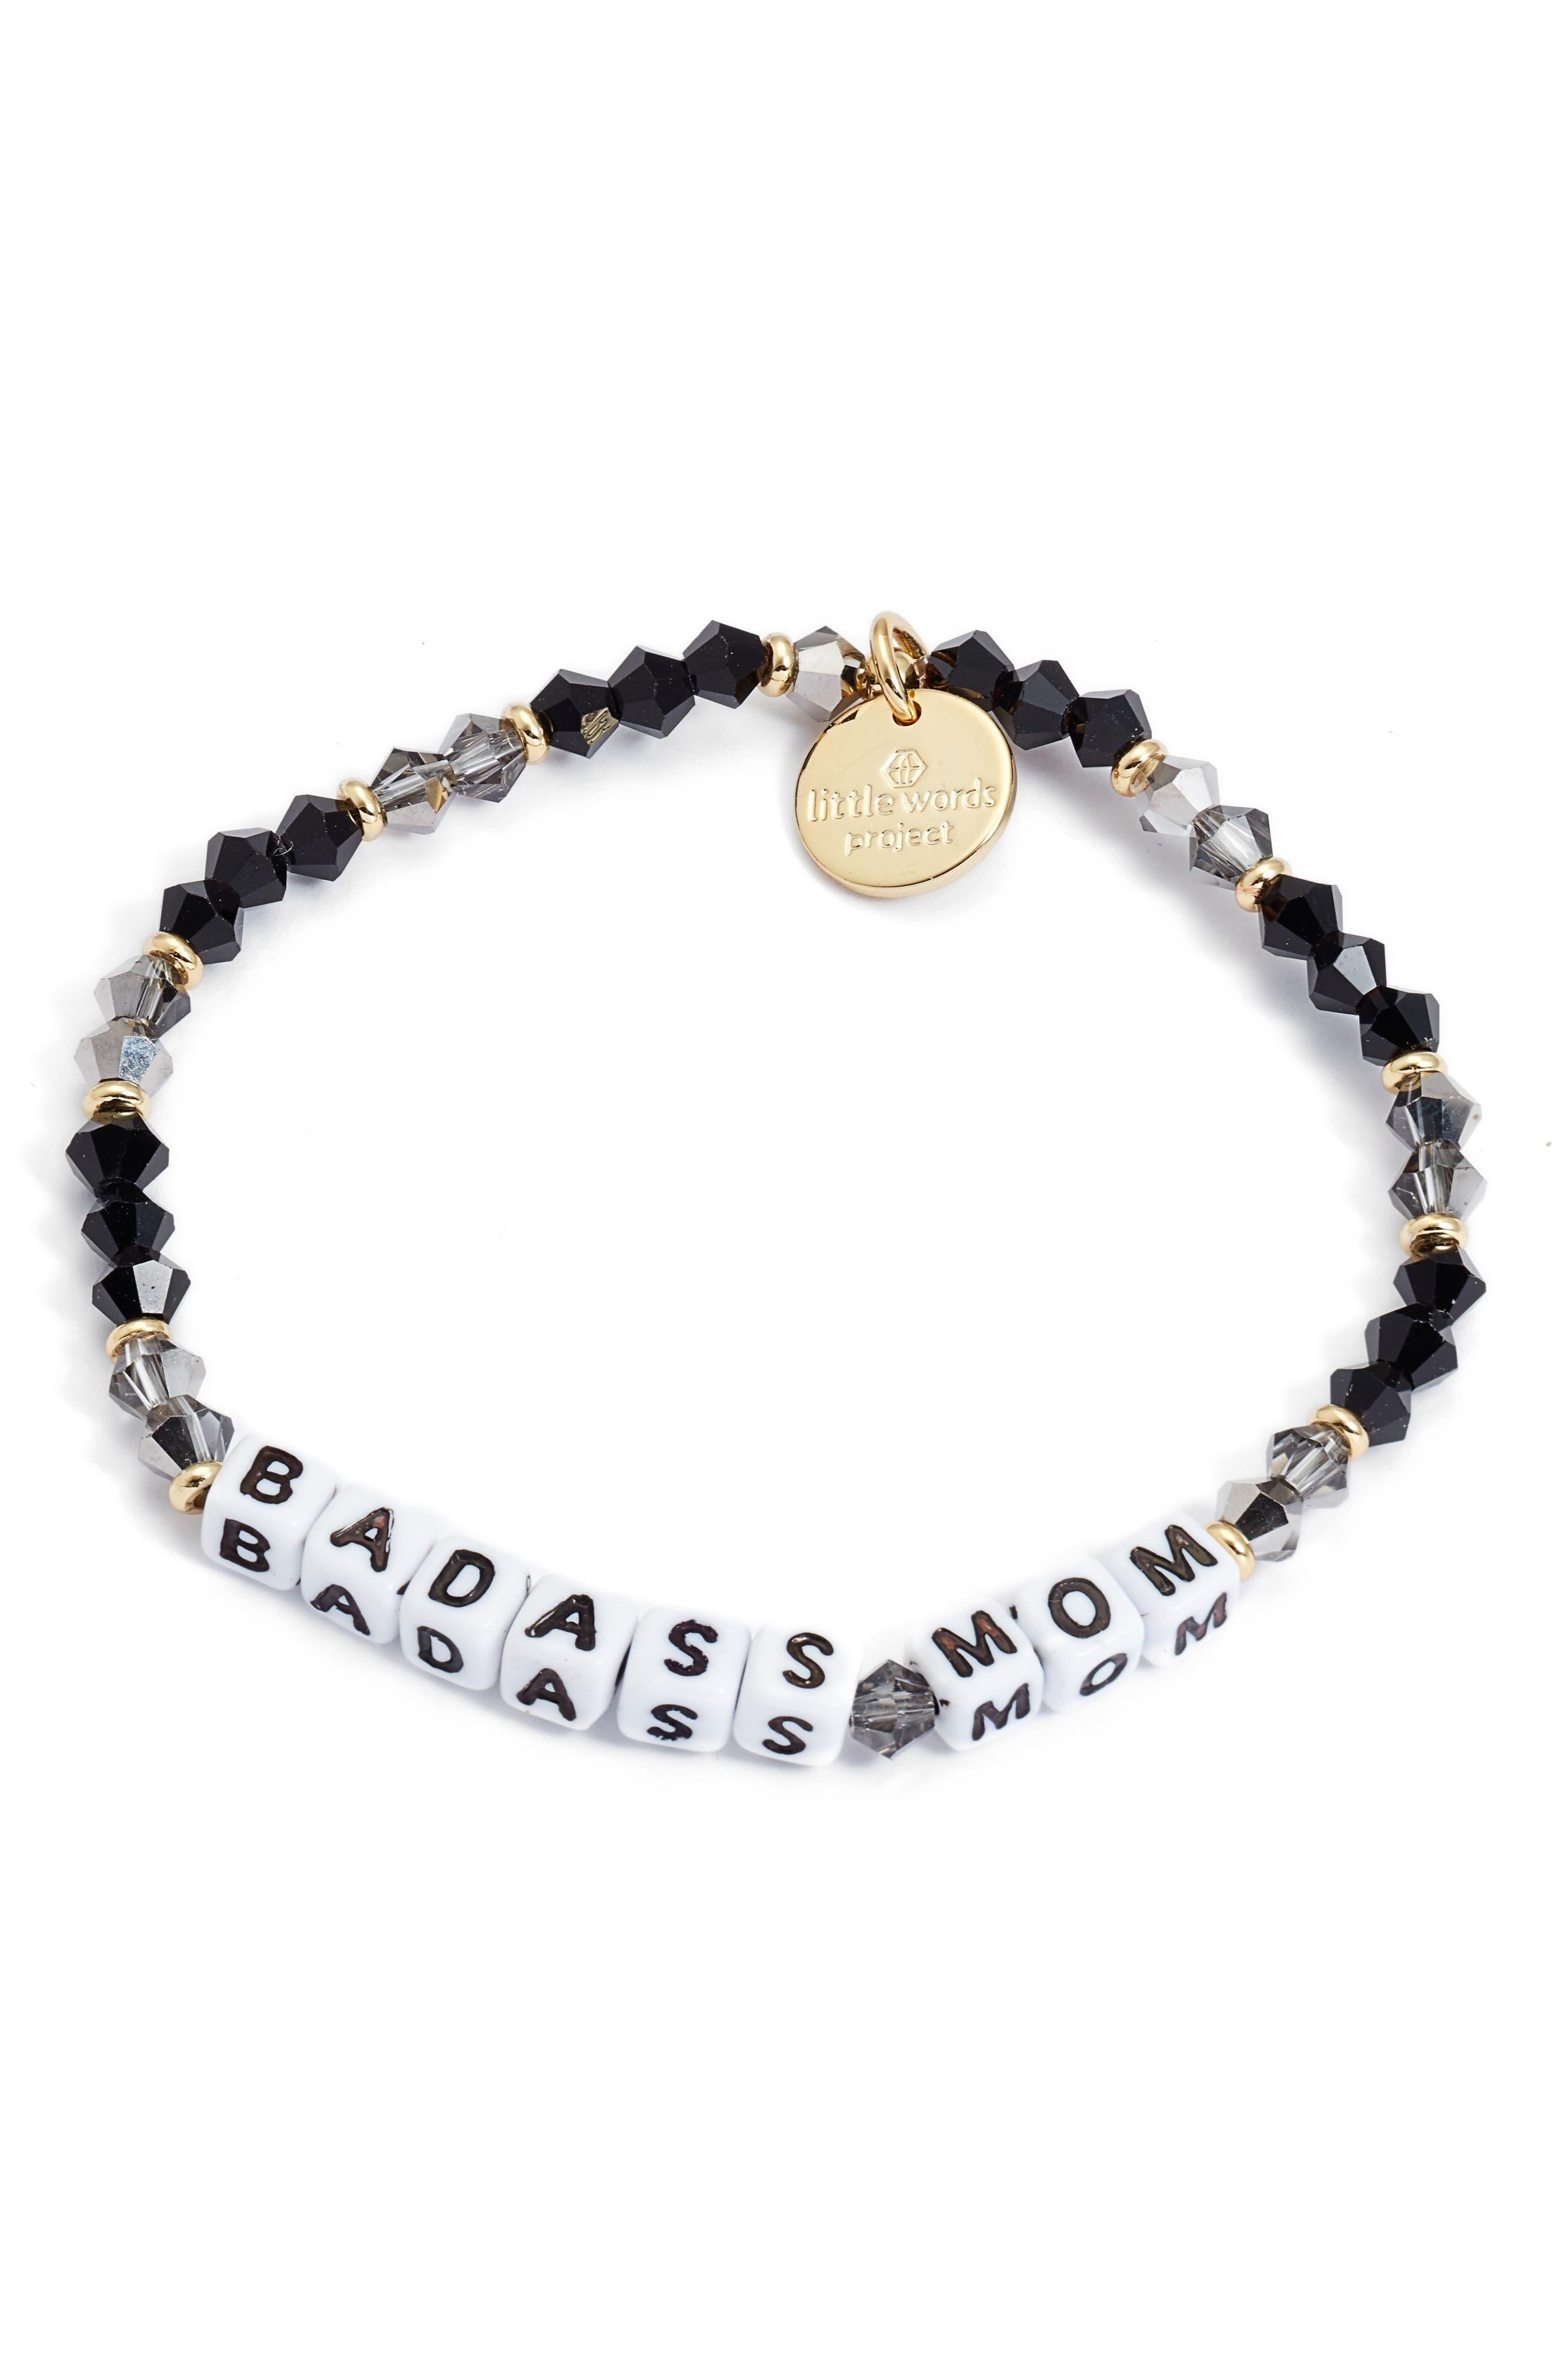 Badass Mom Beaded Bracelet